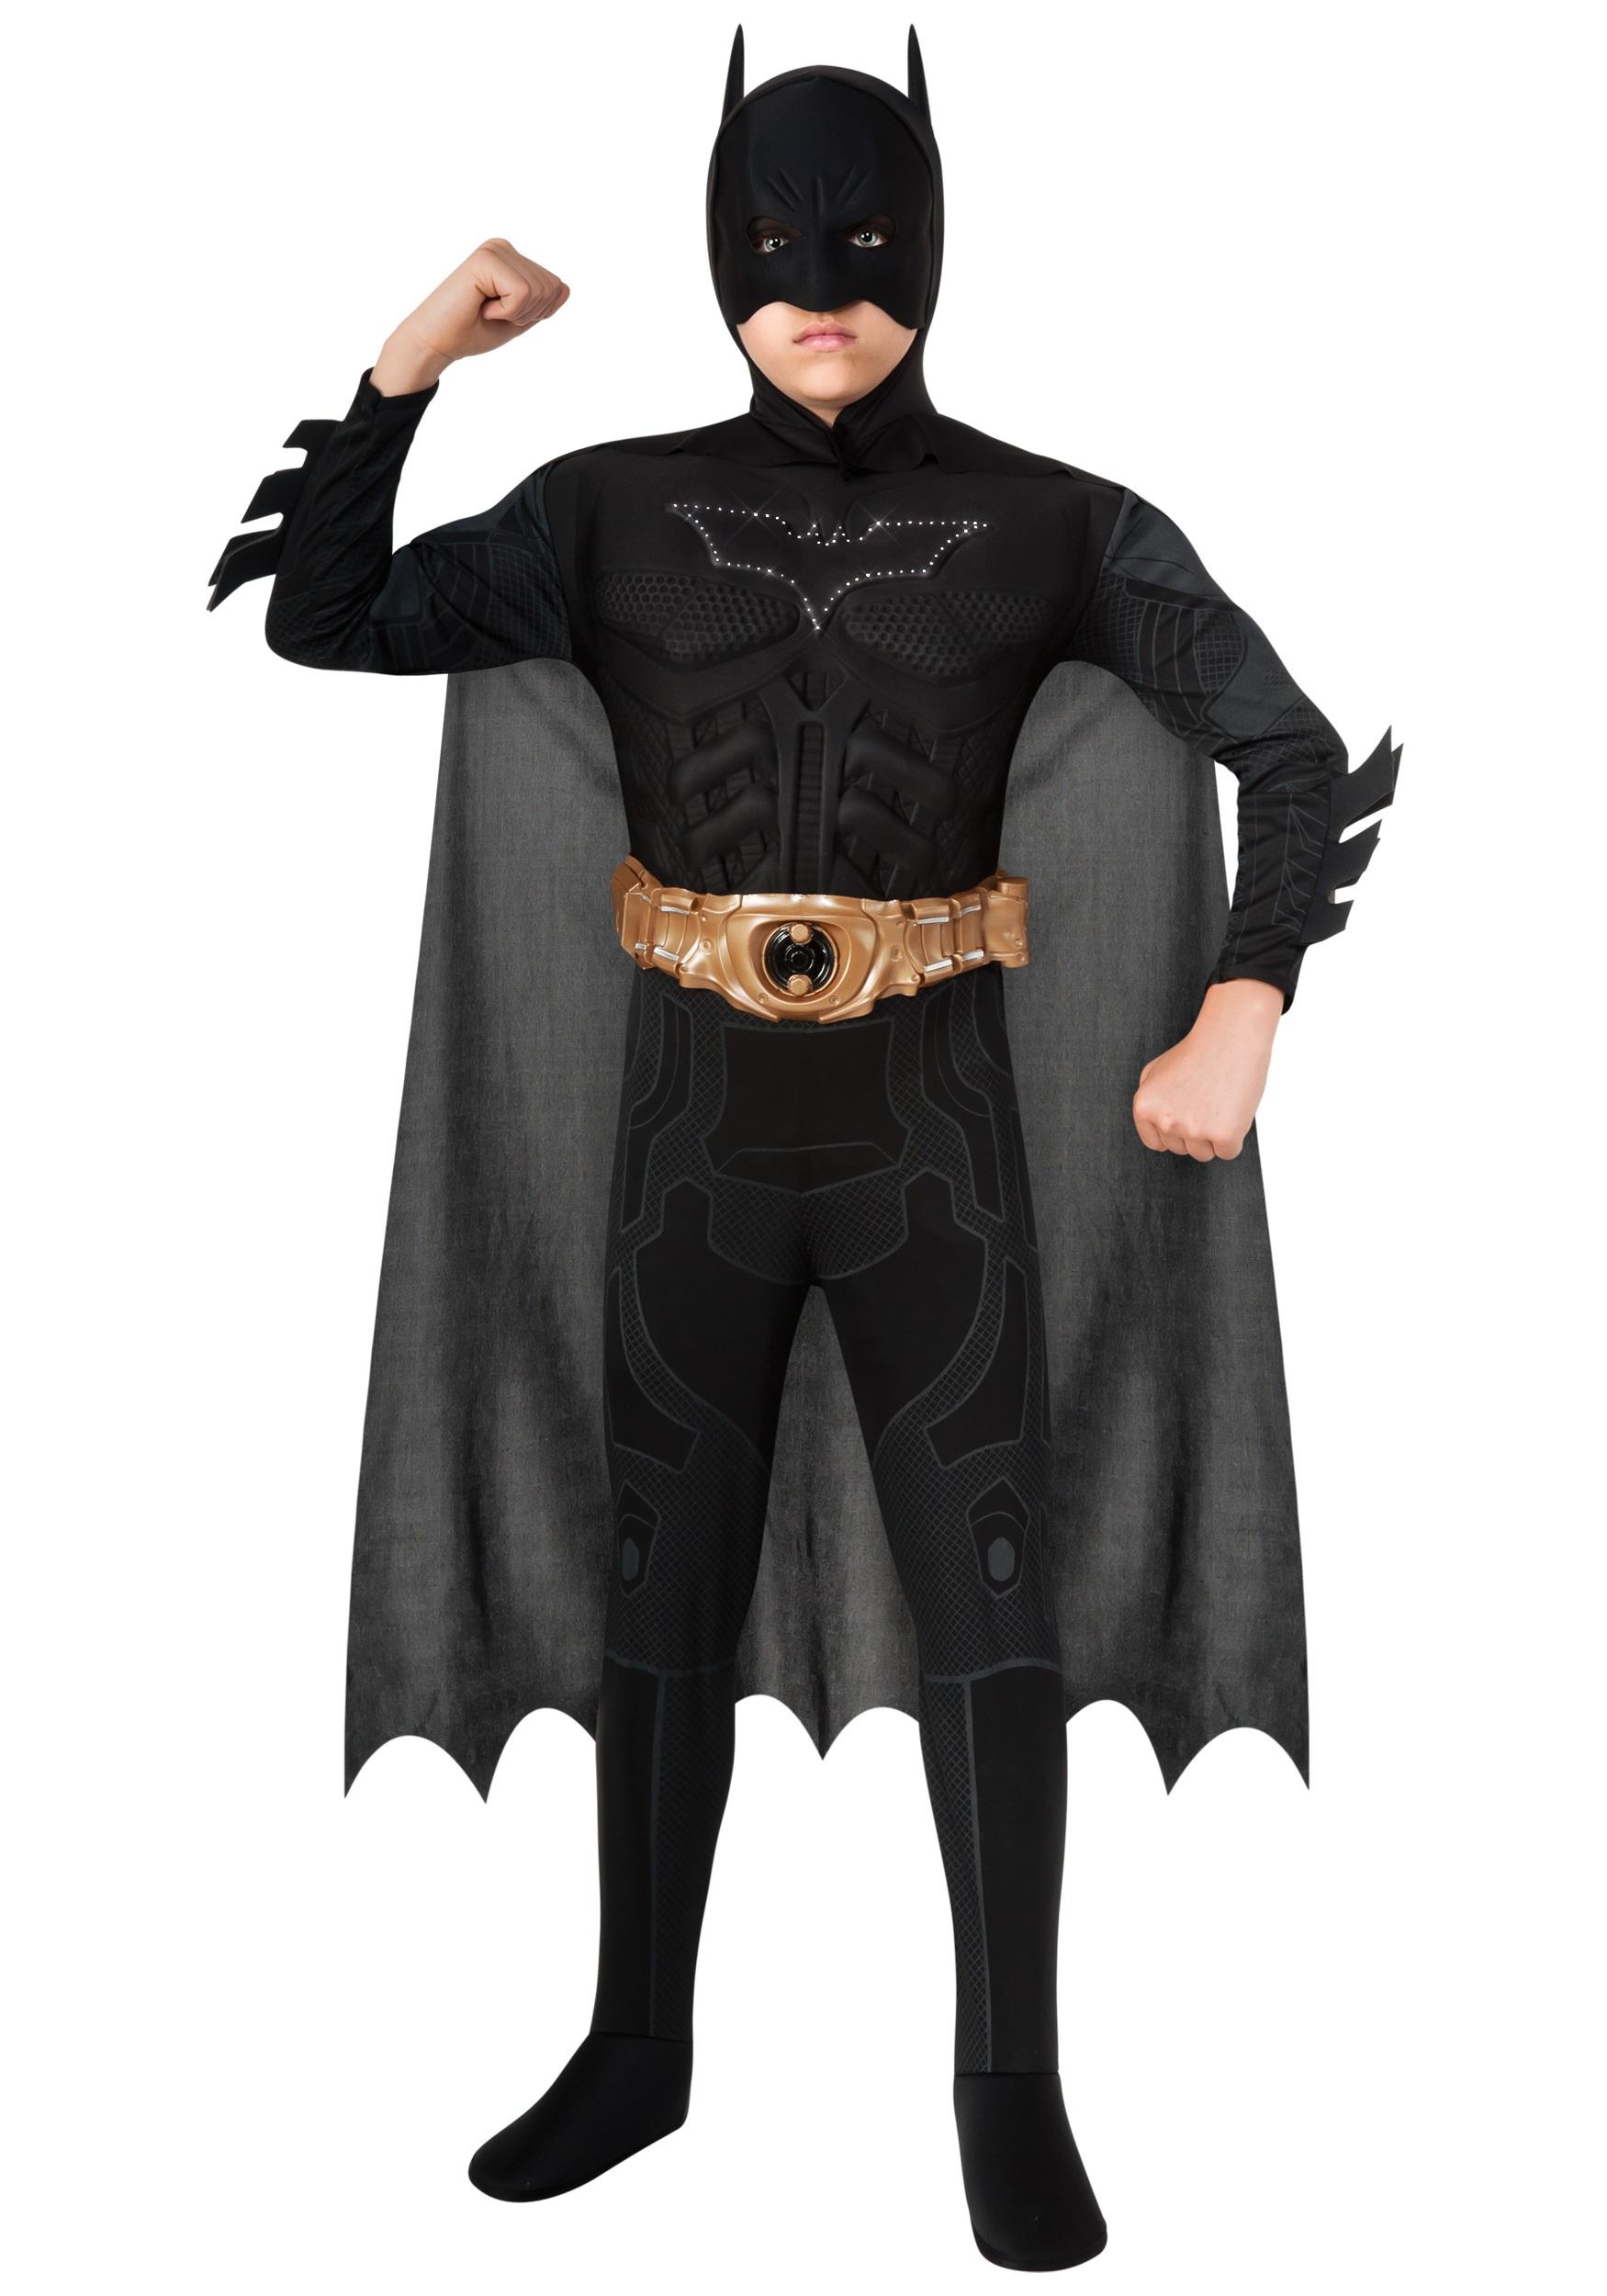 Child Light Up Batman Costume  sc 1 st  Halloween Costumes & Batman Costumes u0026 Suits For Halloween - HalloweenCostumes.com